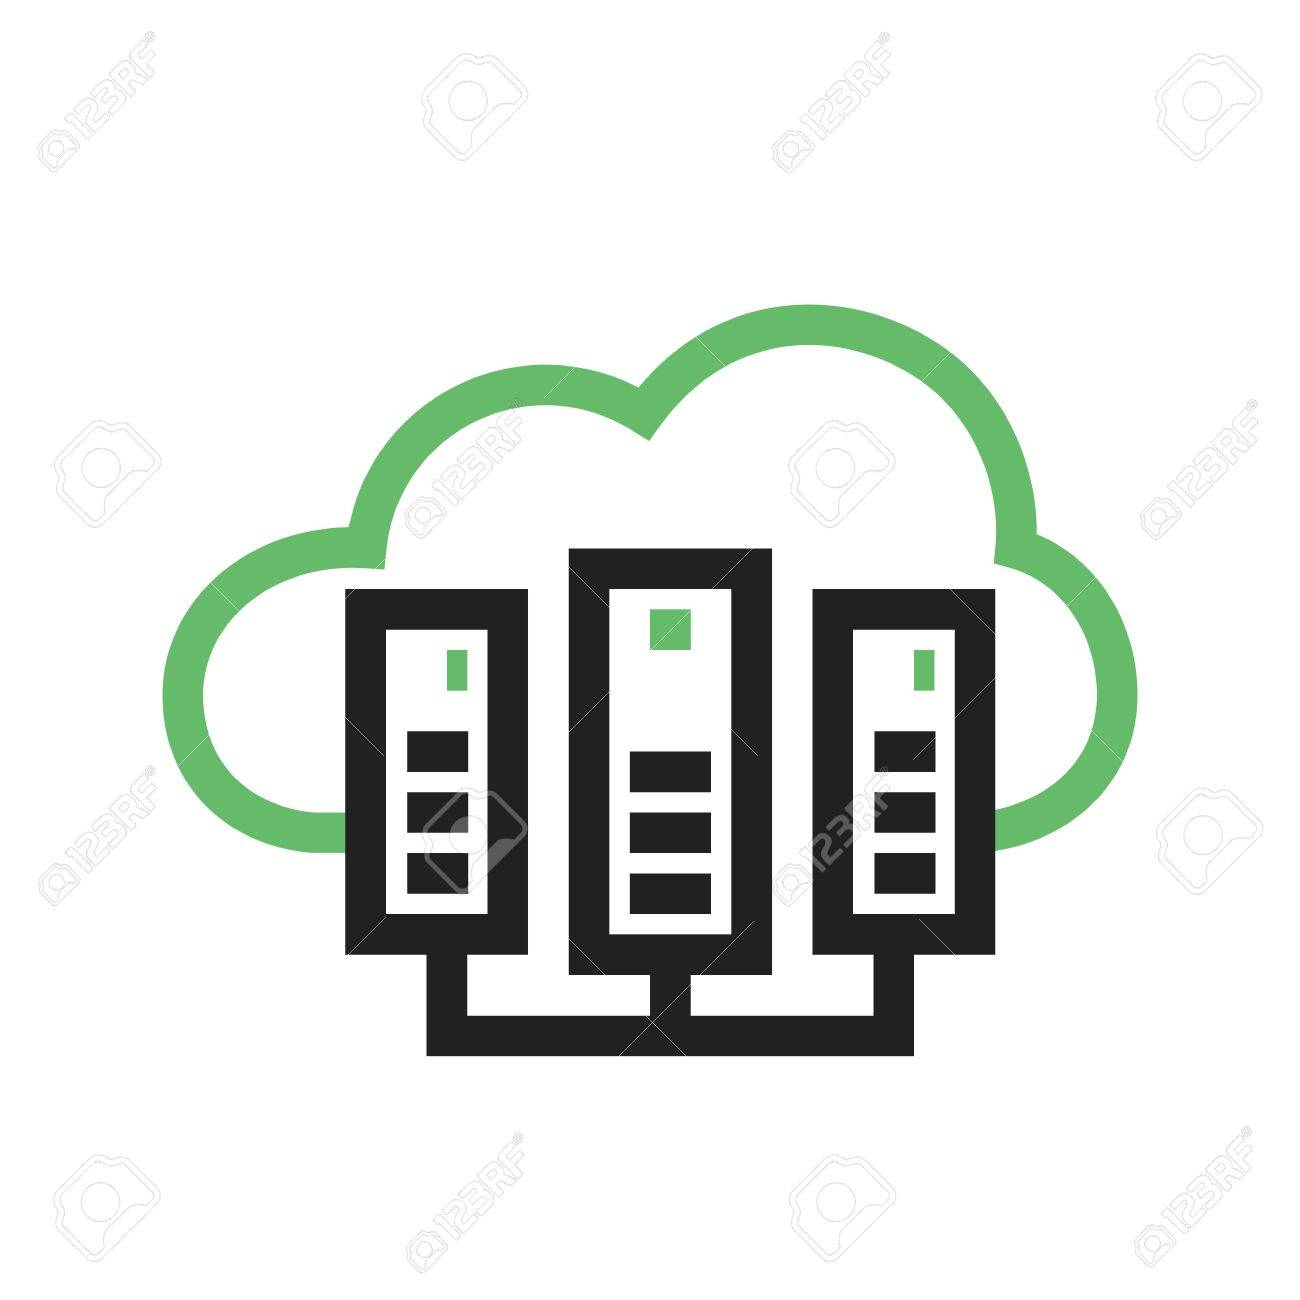 cloud computing server icon image royalty free cliparts vectors